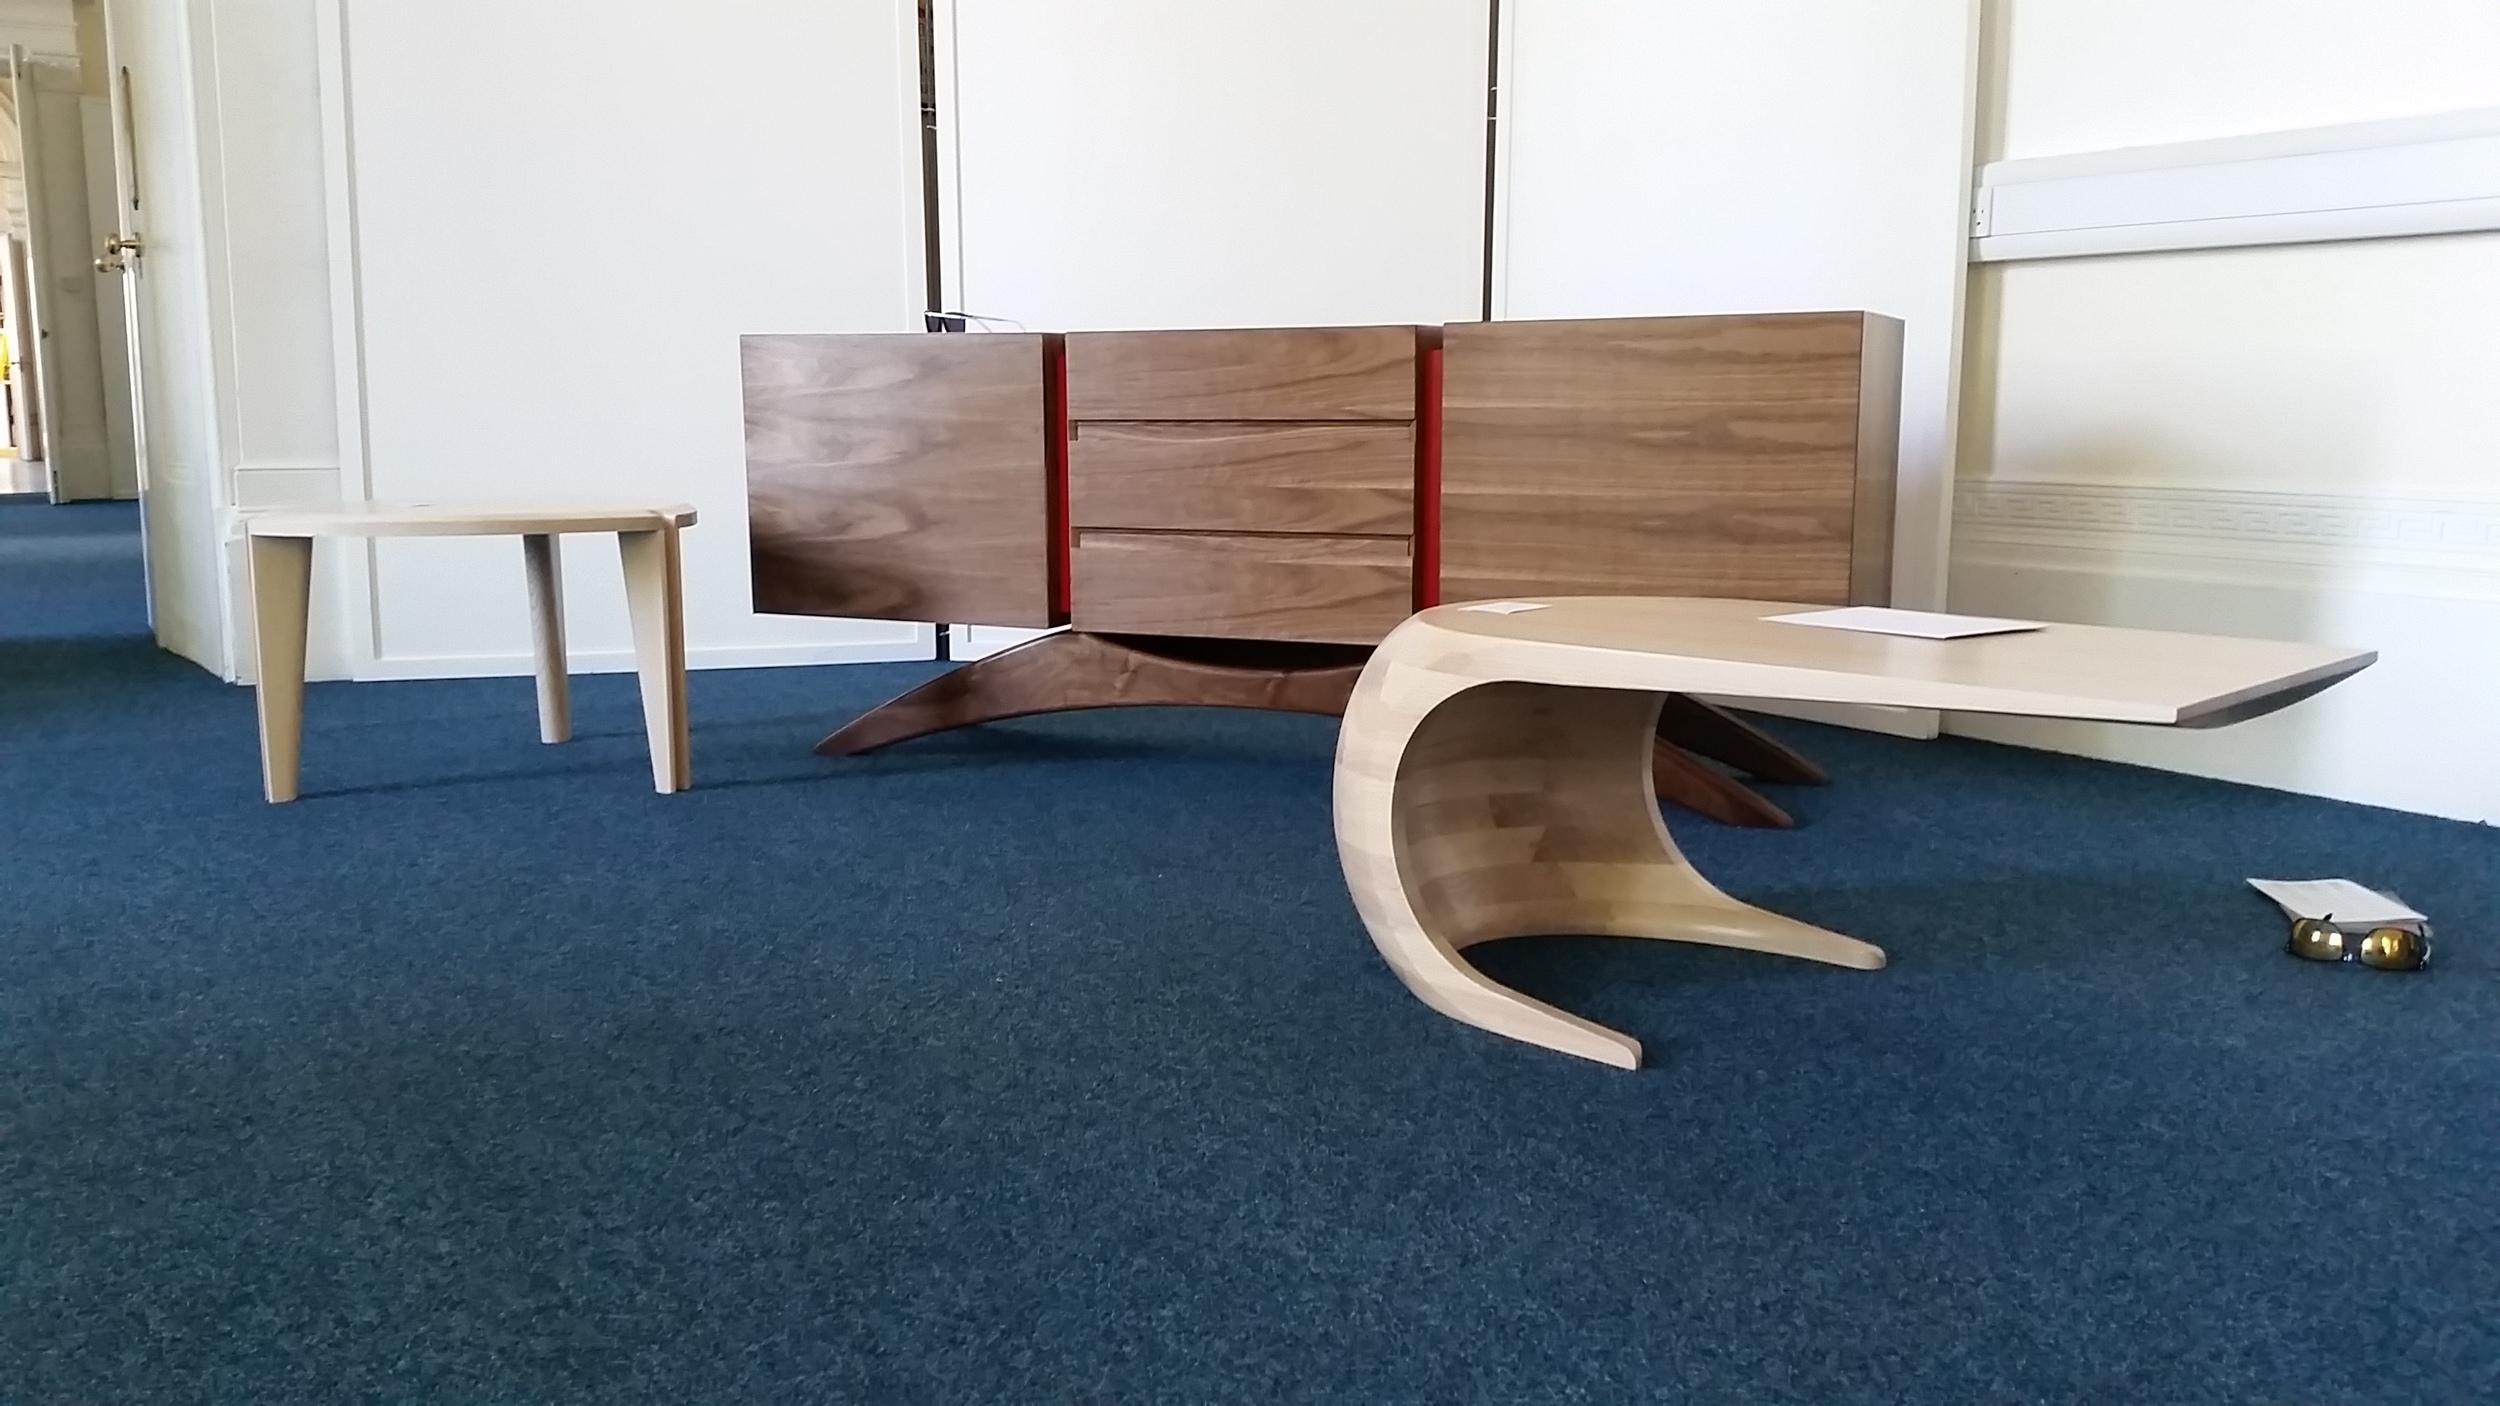 """Fleure"", ""Retrospect"" and ""Tephra"" delivered to the Celebration of Craftsmanship and Design Cheltenham"